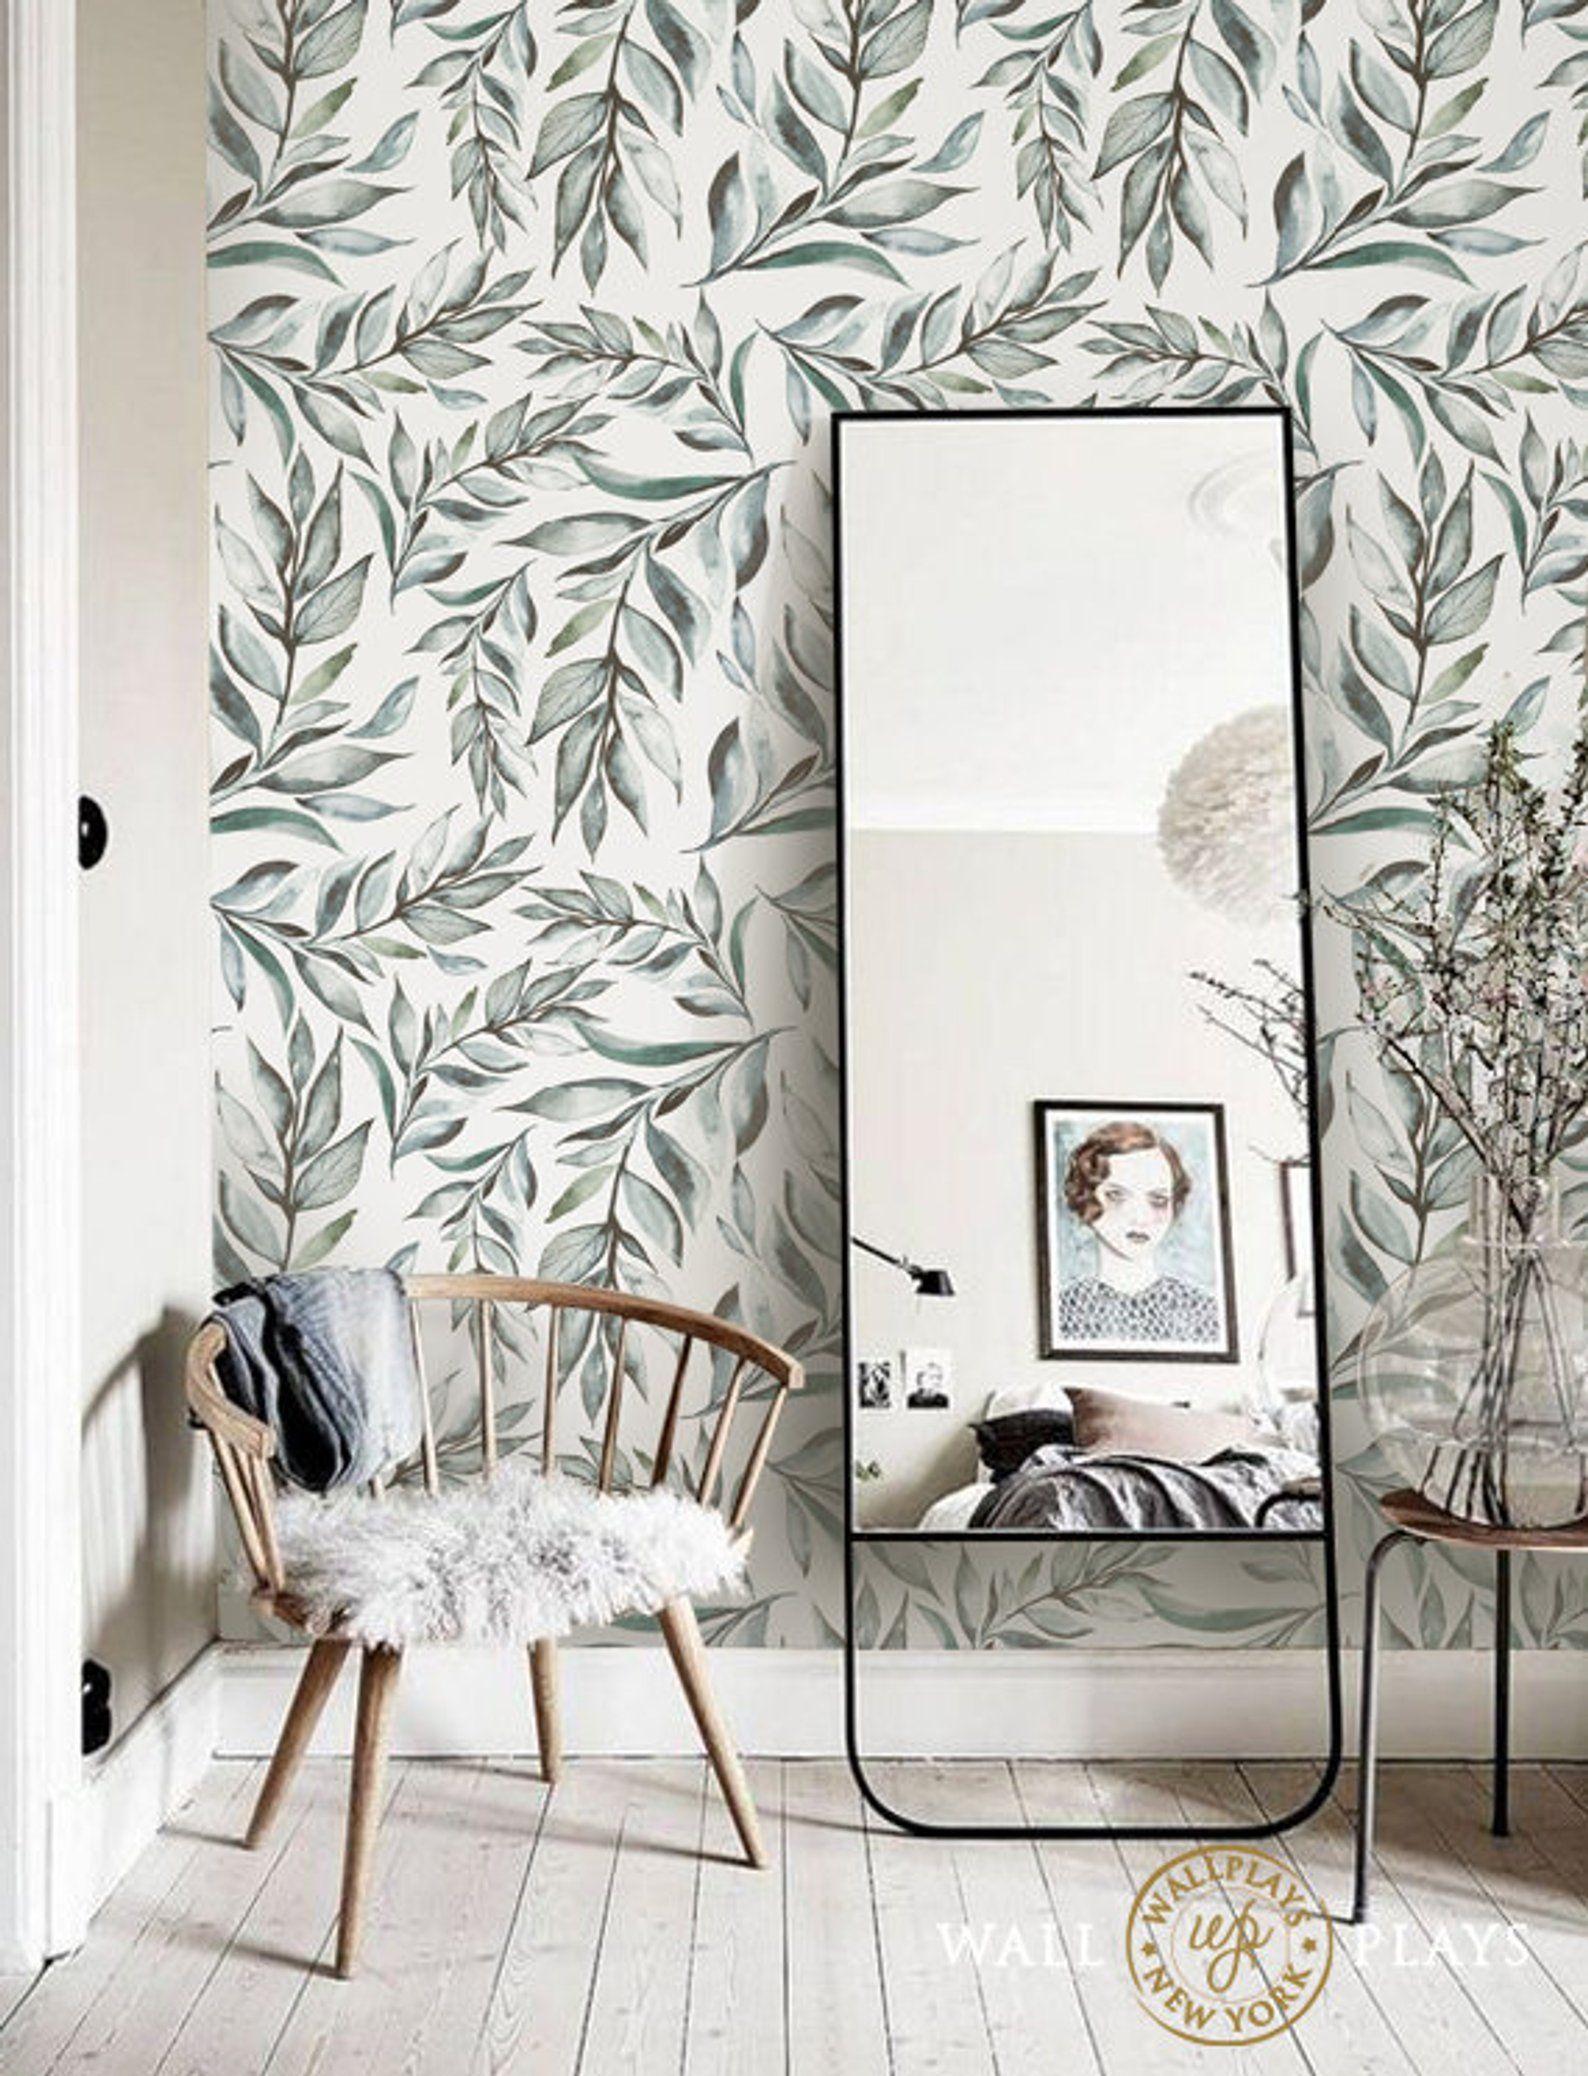 Boho Leaves Watercolor Removable Wallpaper Peel & Stick